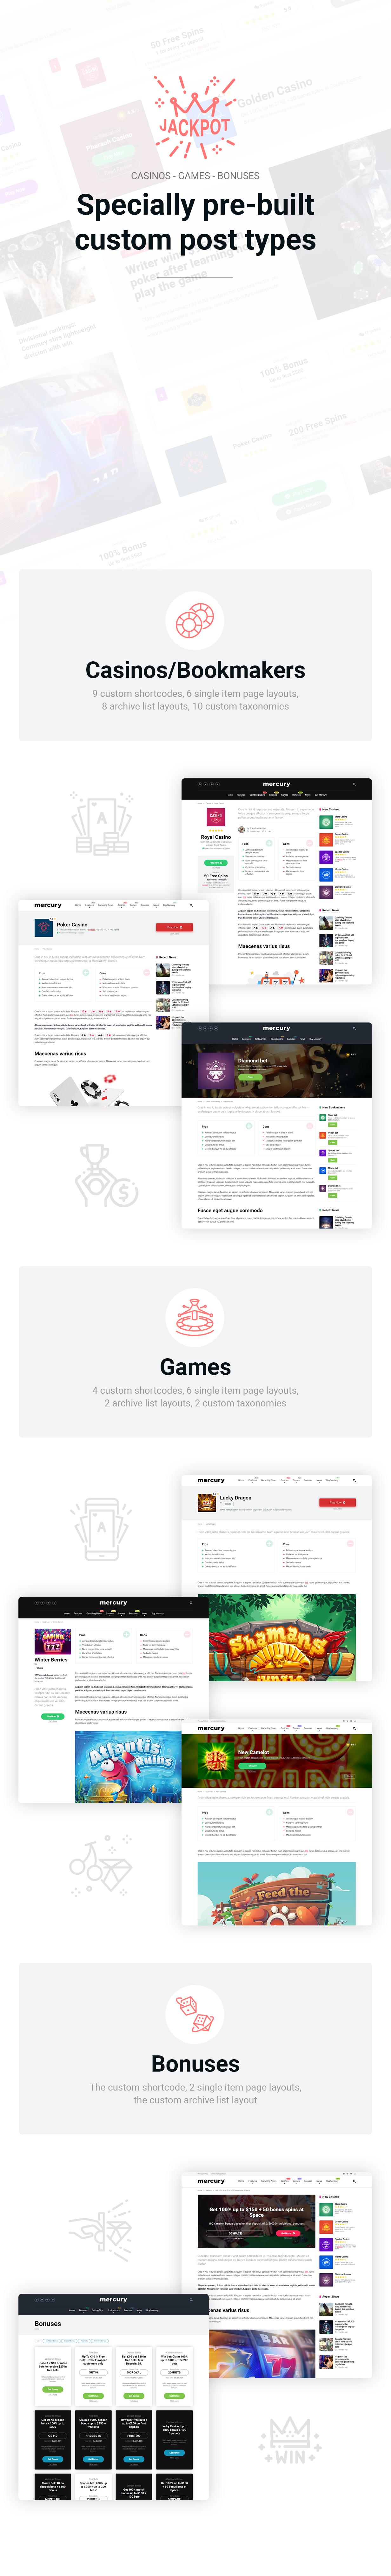 item page landing 2 - Mercury - Affiliate WordPress Theme. Casino, Gambling & Other Niches. Reviews & News